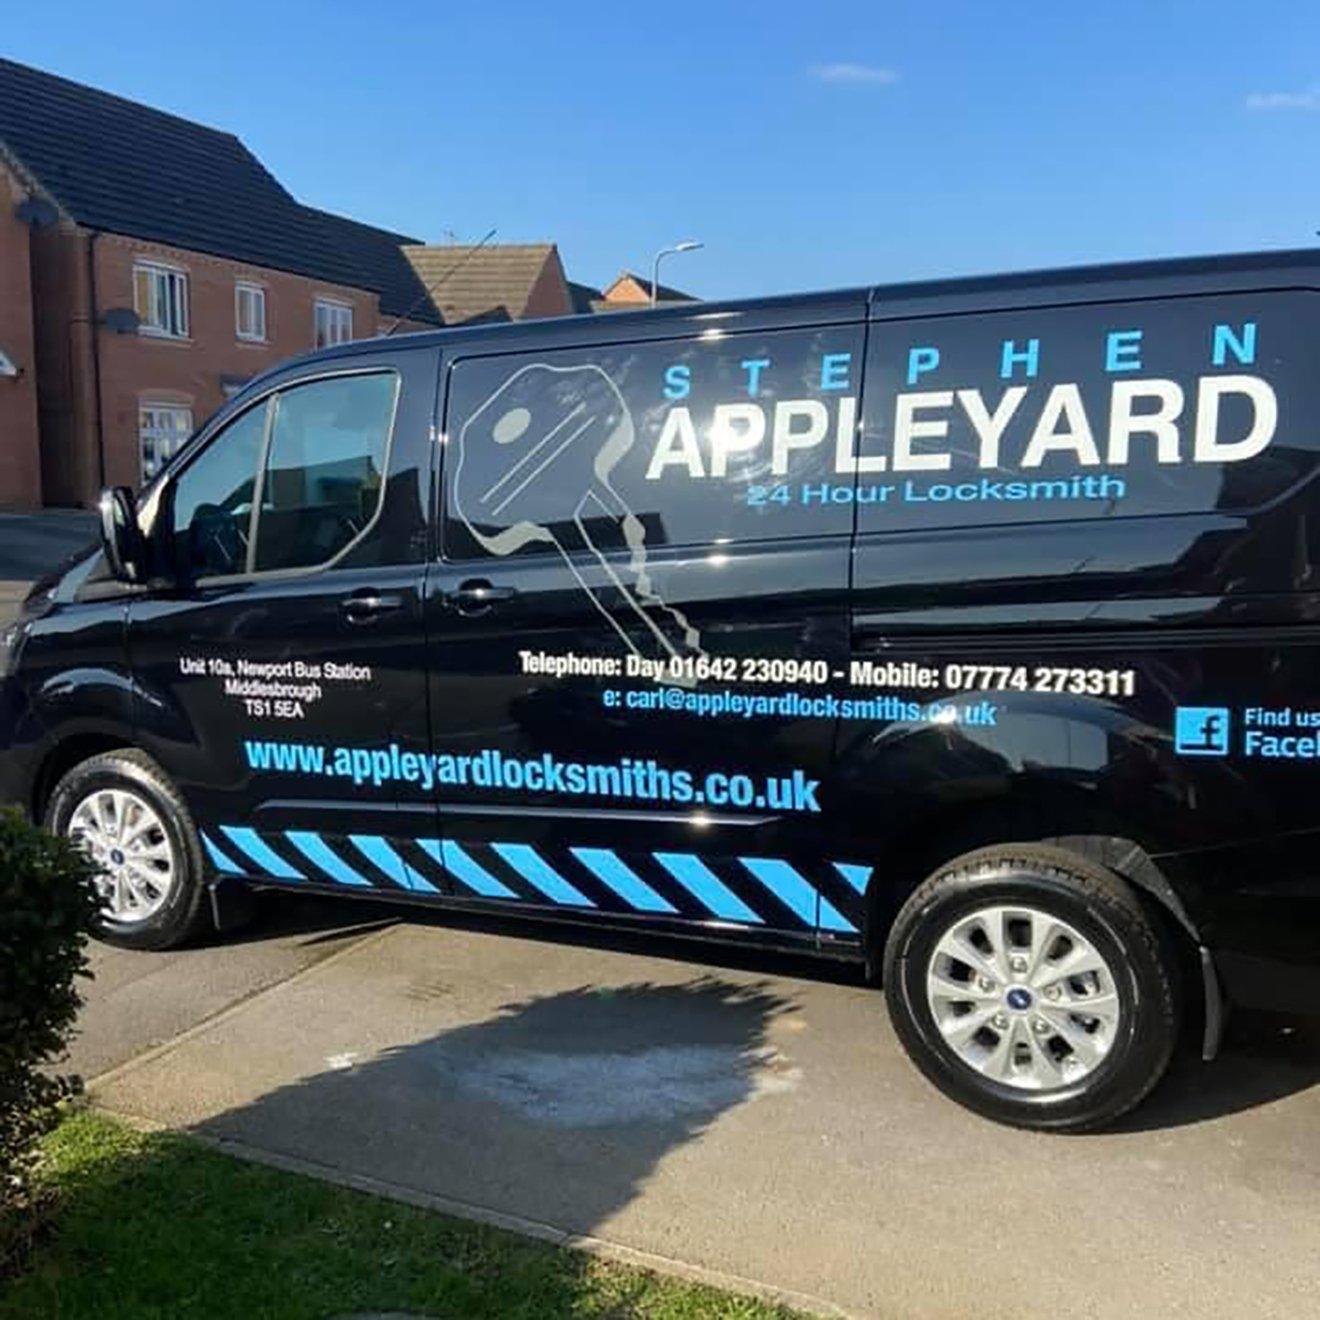 Stephen Appleyards 24hr Locksmiths